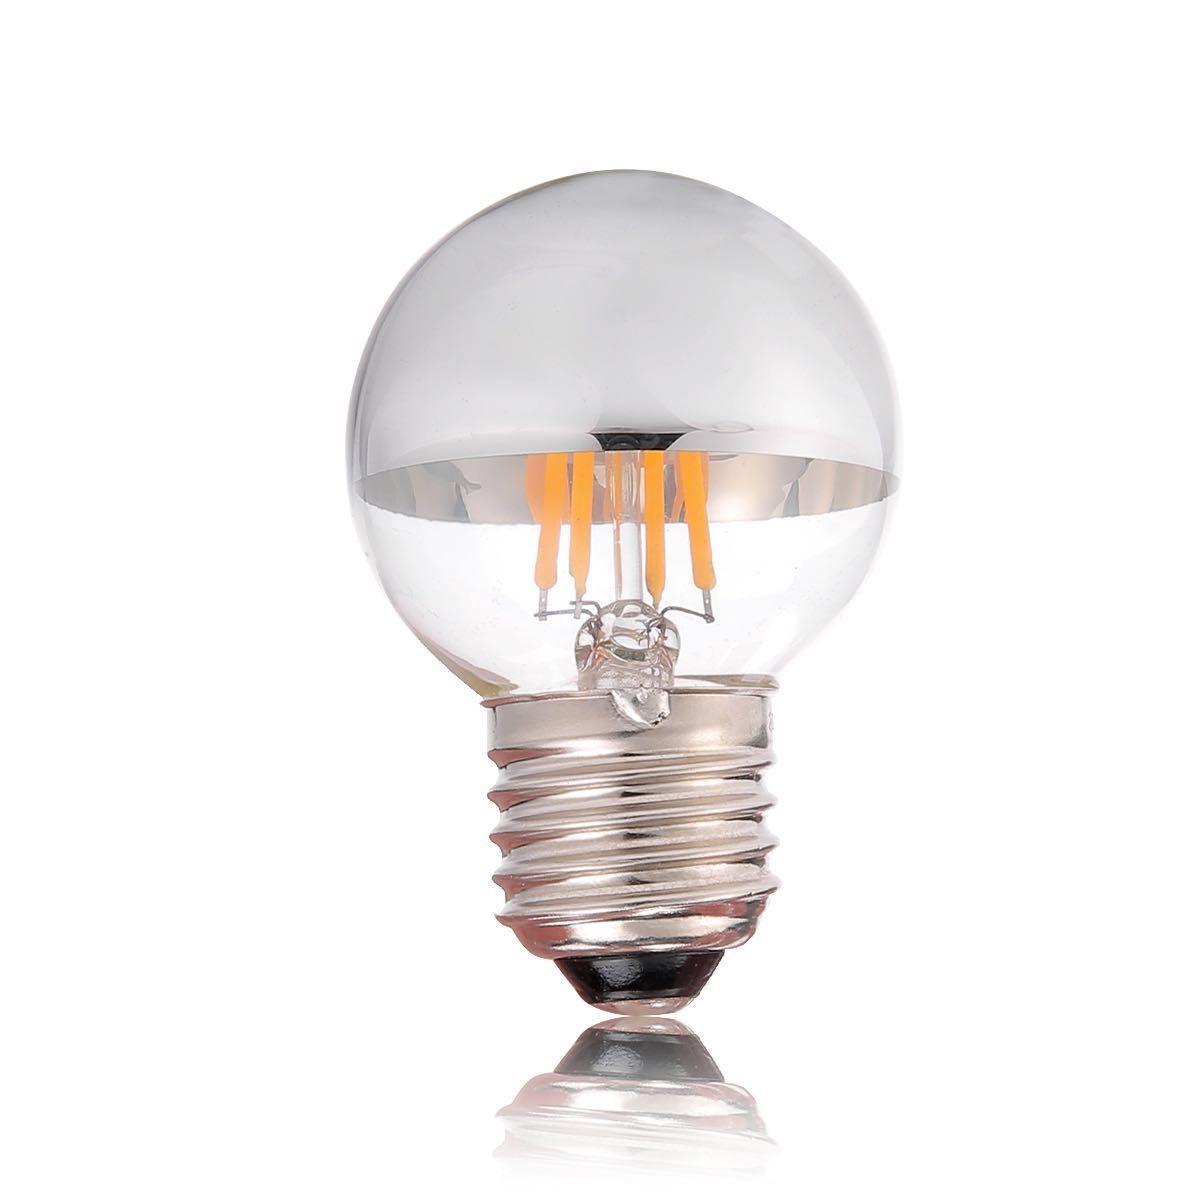 pas cher 4w dimmable sliver bowl vintage ampoule filament led blanc chaud g45 globe l. Black Bedroom Furniture Sets. Home Design Ideas